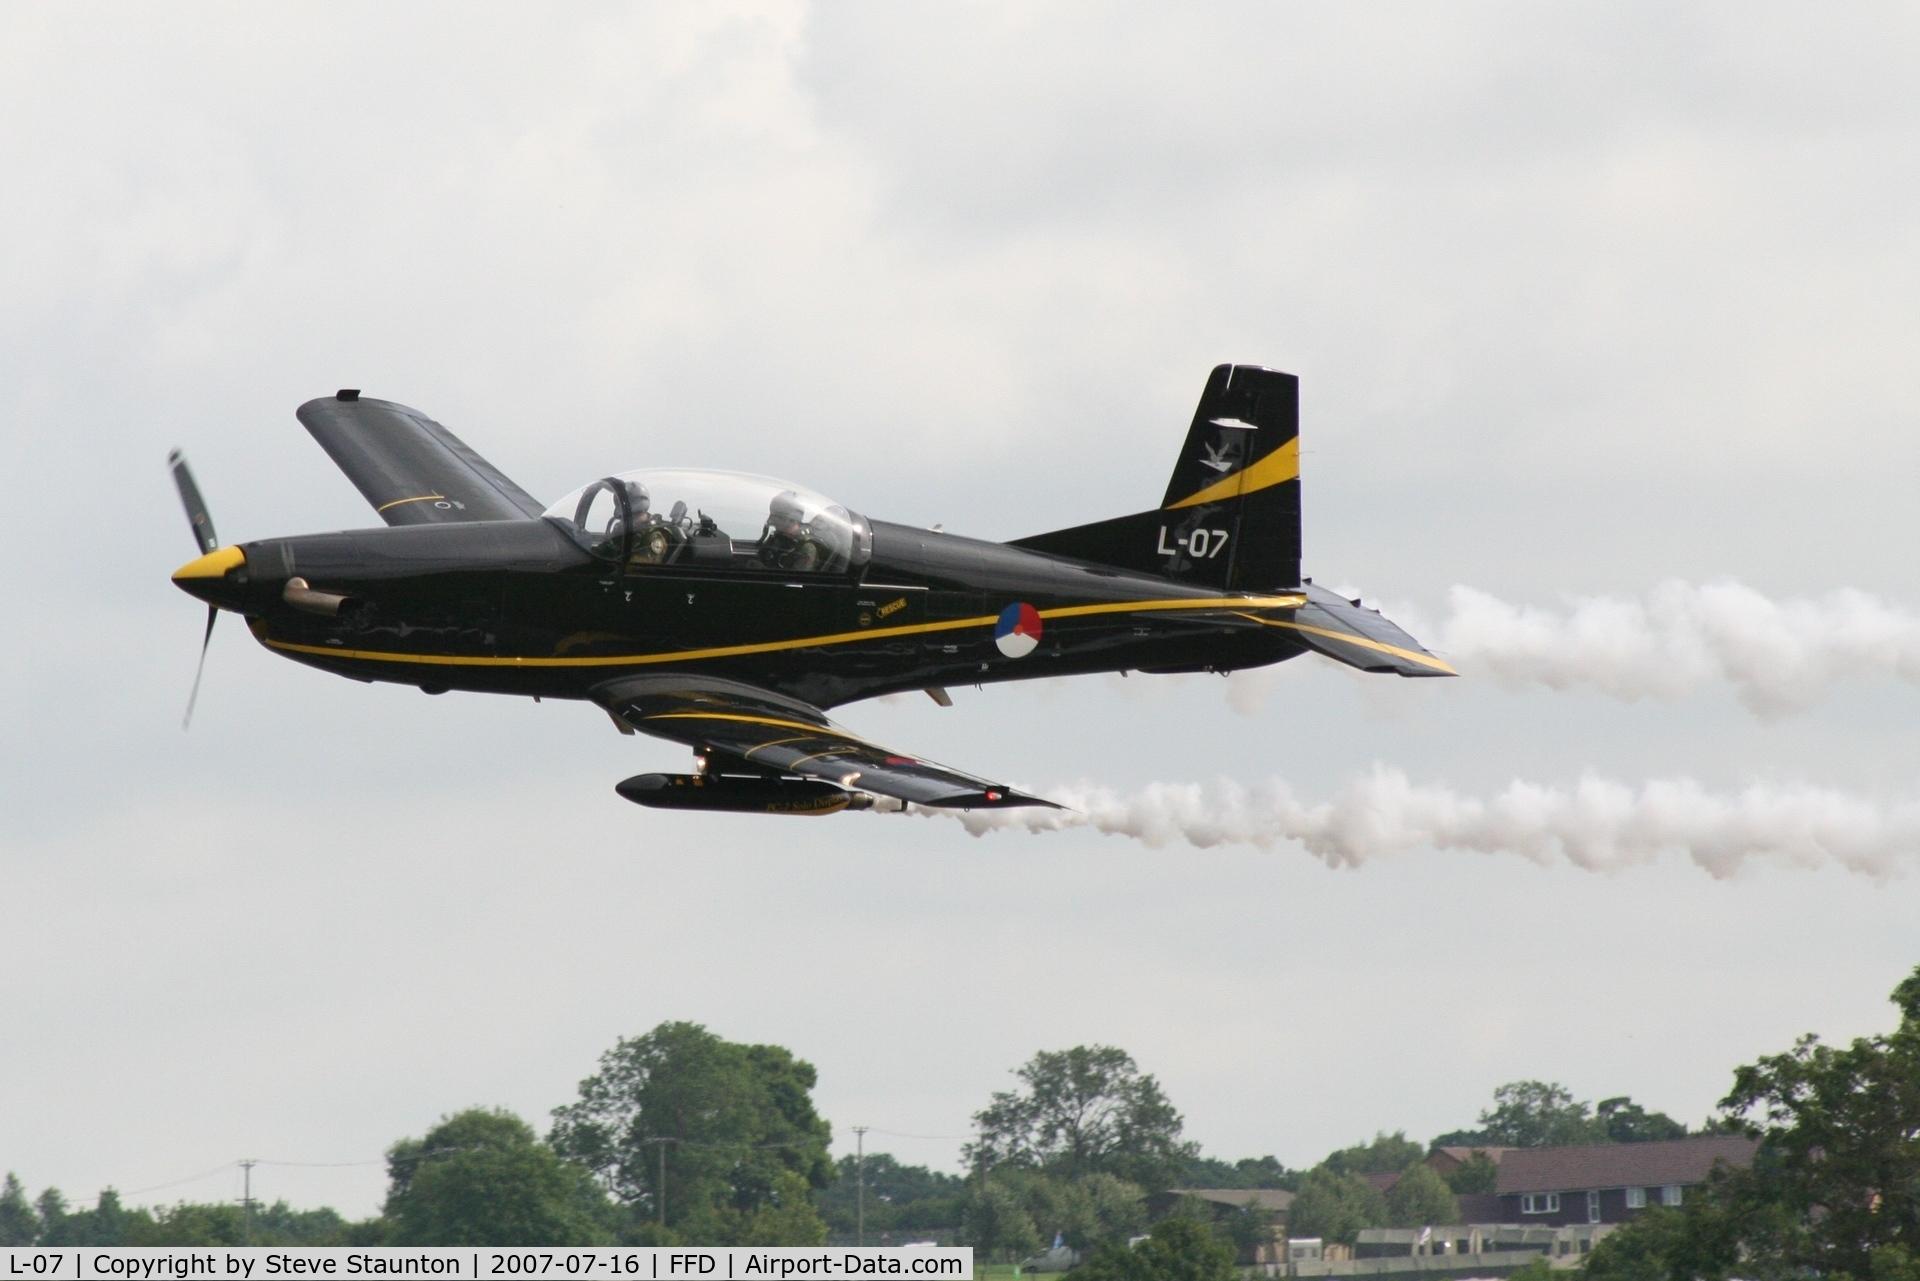 L-07, Pilatus PC-7 Turbo Trainer C/N 544, Royal International Air Tattoo 2007